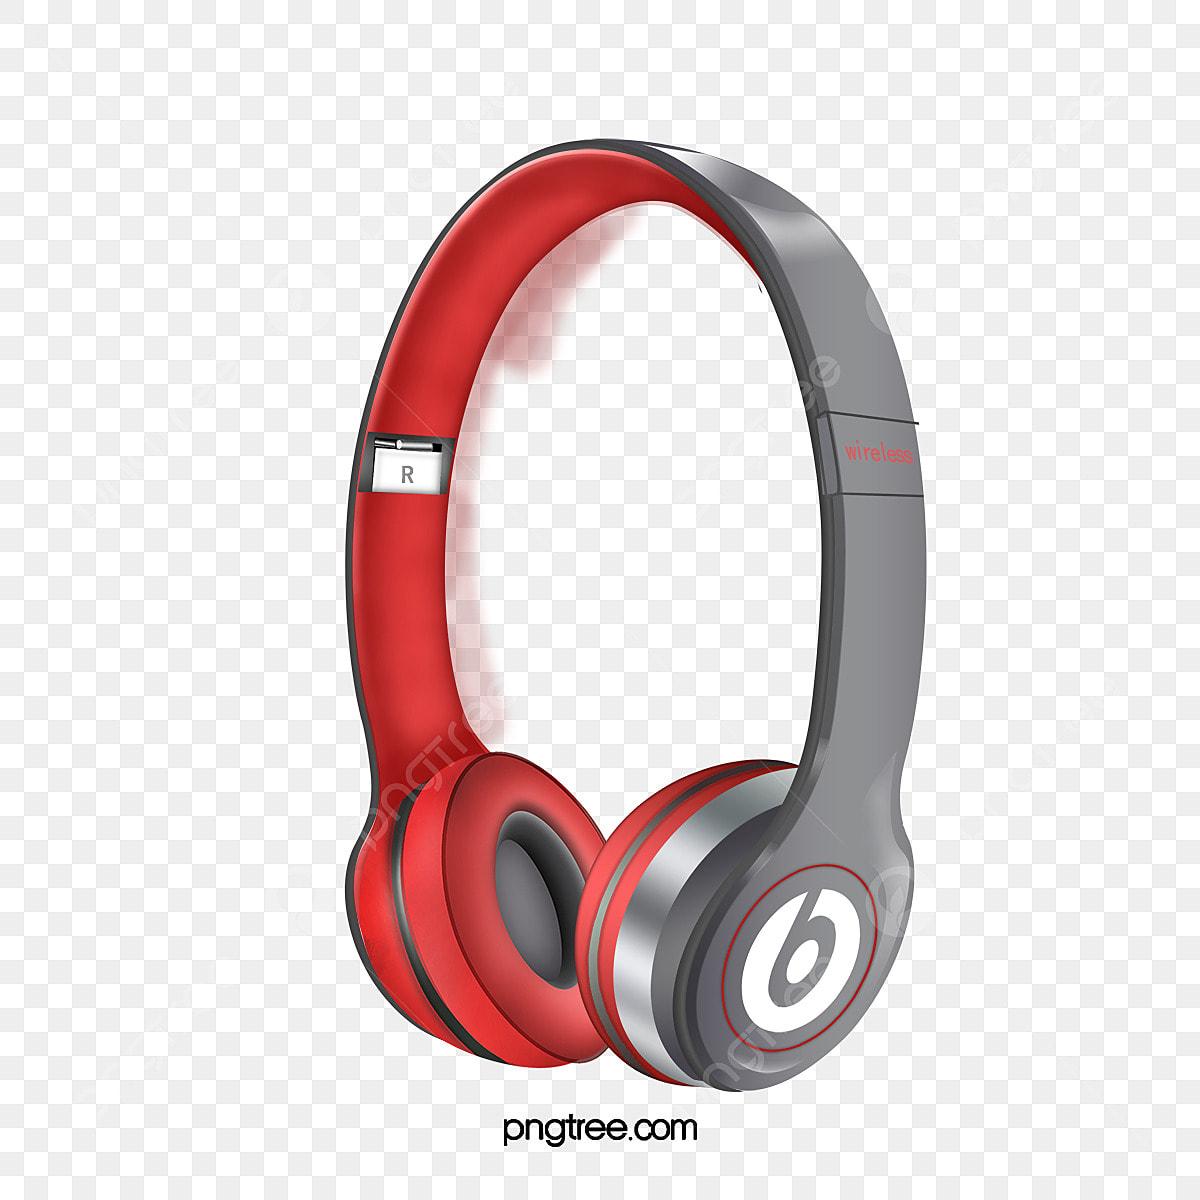 Headphones Headphones Clipart Hifi Headphones Beats Headphones Png Transparent Clipart Image And Psd File For Free Download